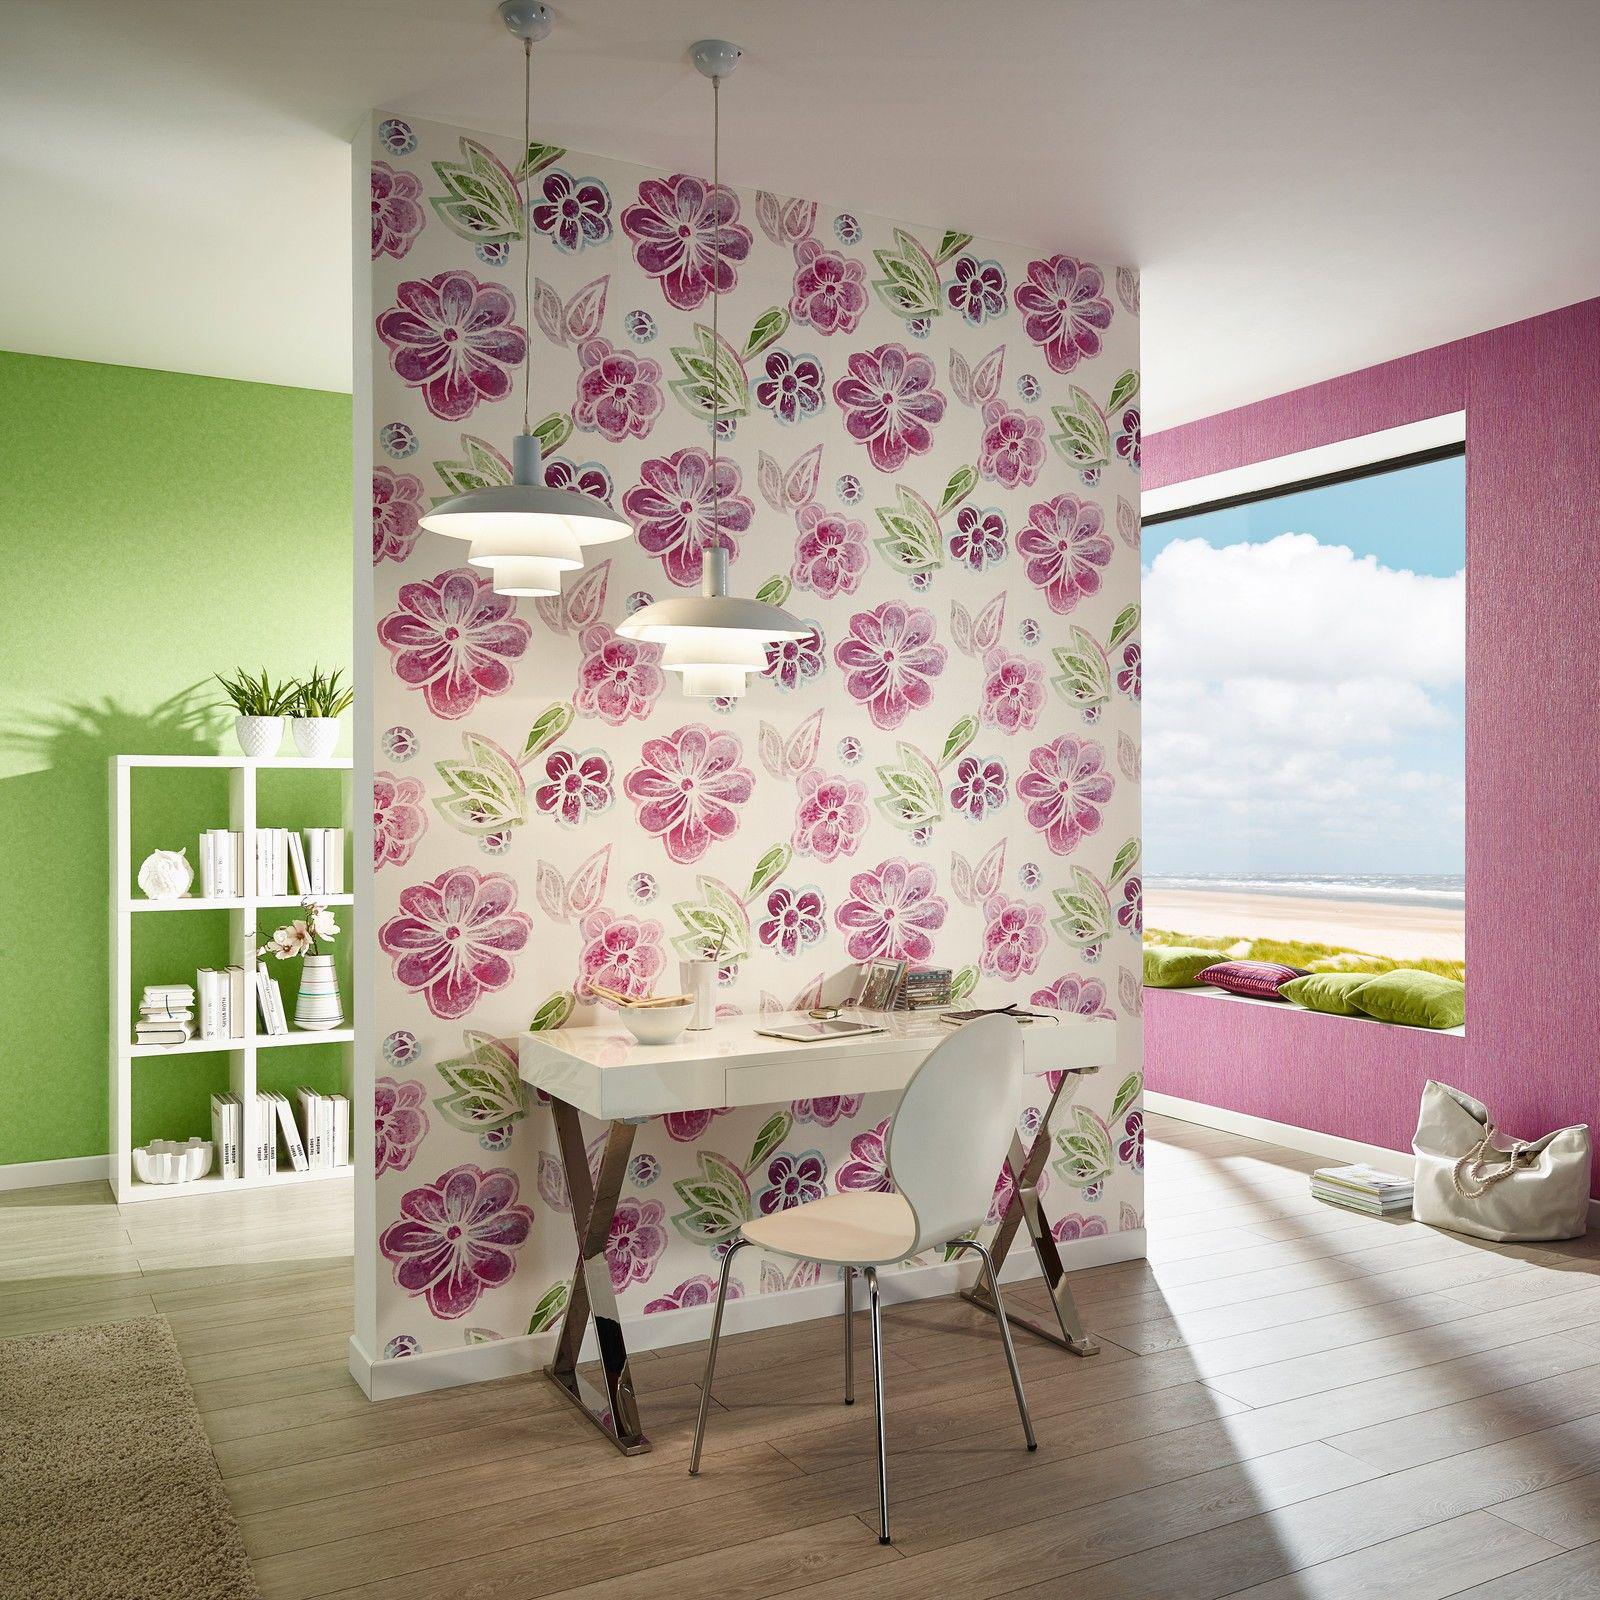 vlies tapete retro blumen muster floral wei pink gr n magenta 3615 30 kaufen bei joratrend e k. Black Bedroom Furniture Sets. Home Design Ideas